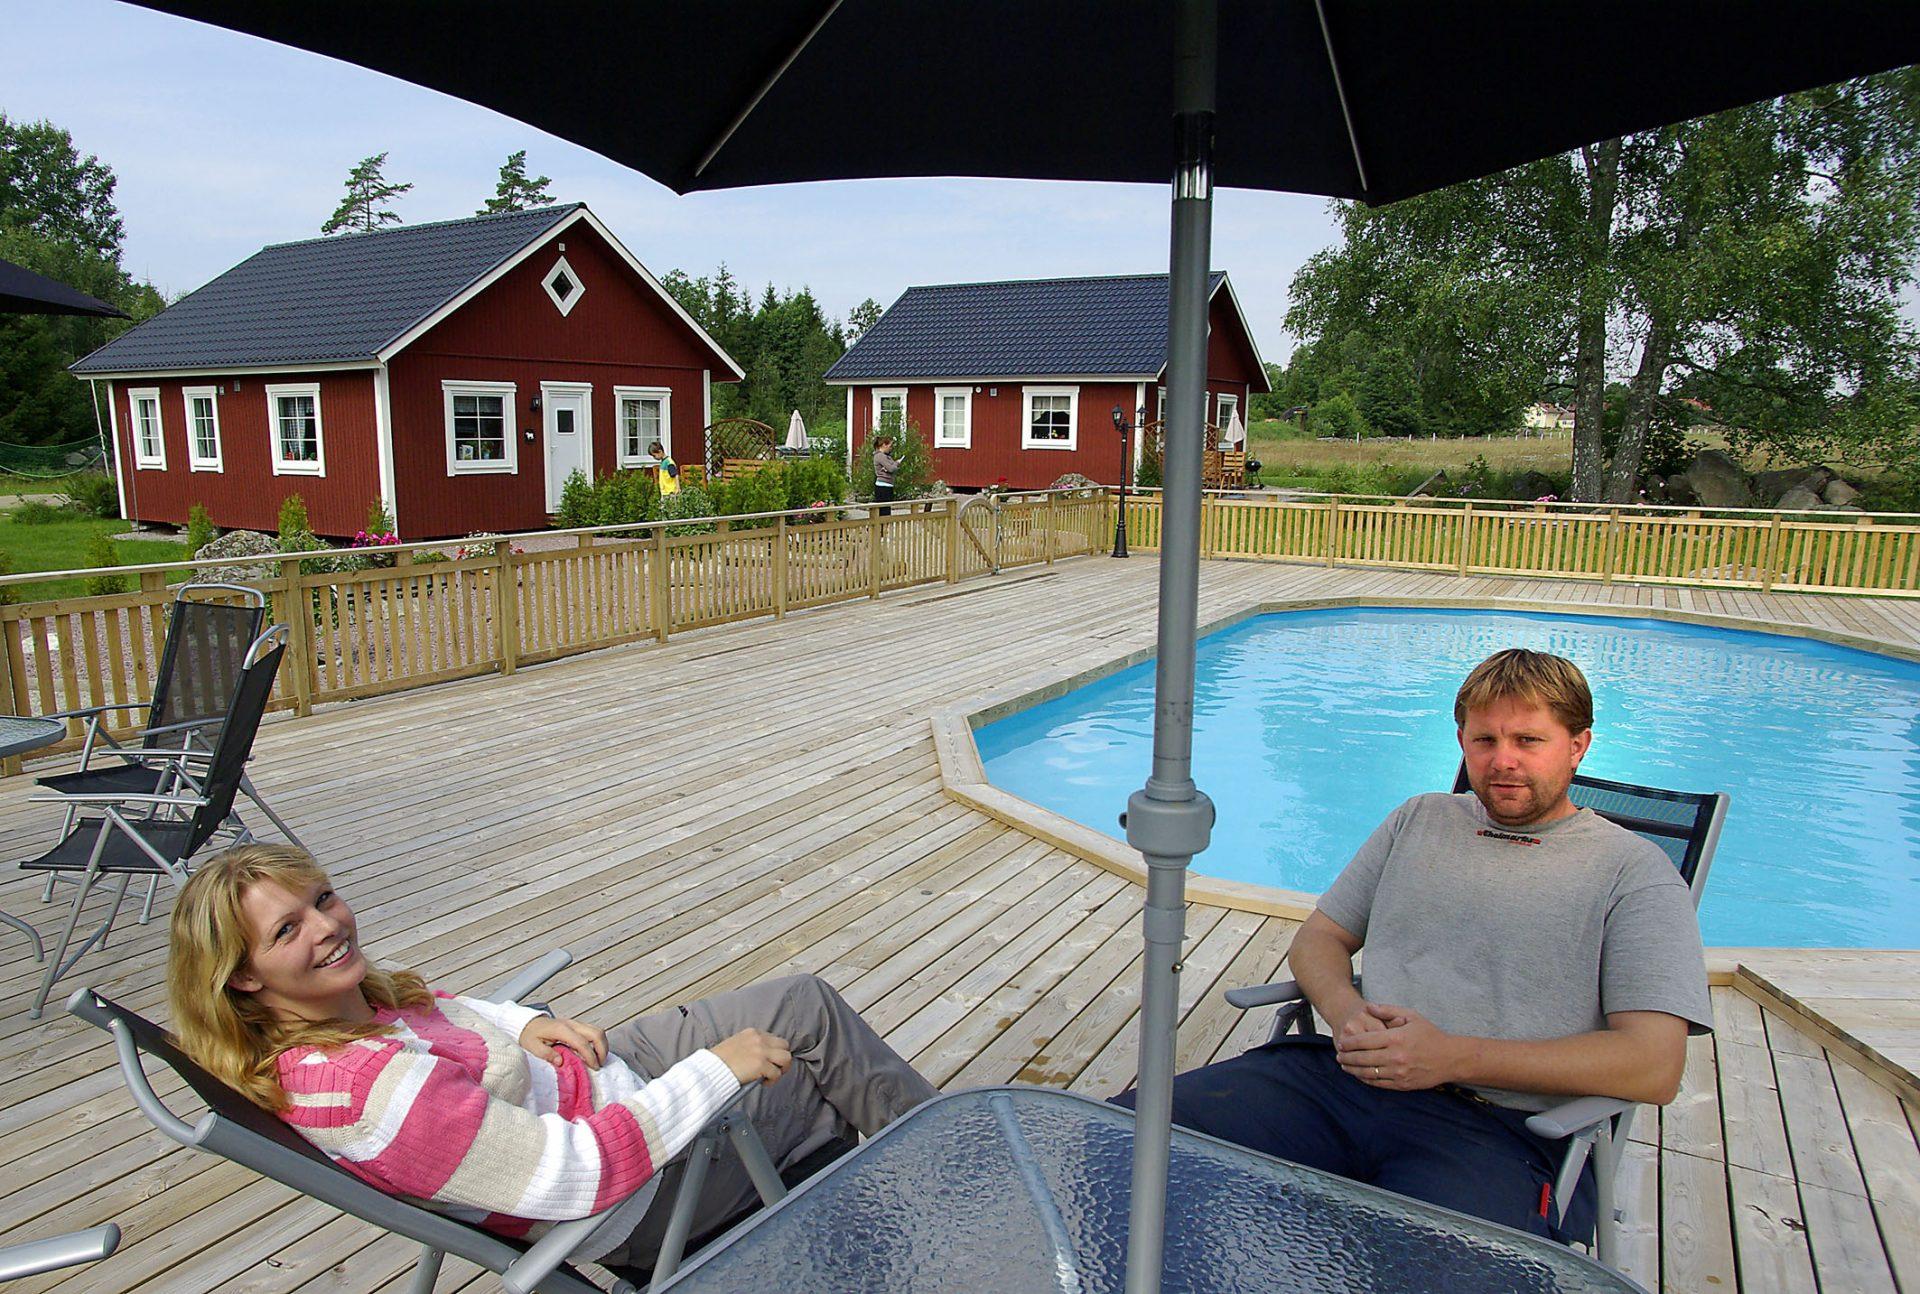 Johan Persson & Mia Närling